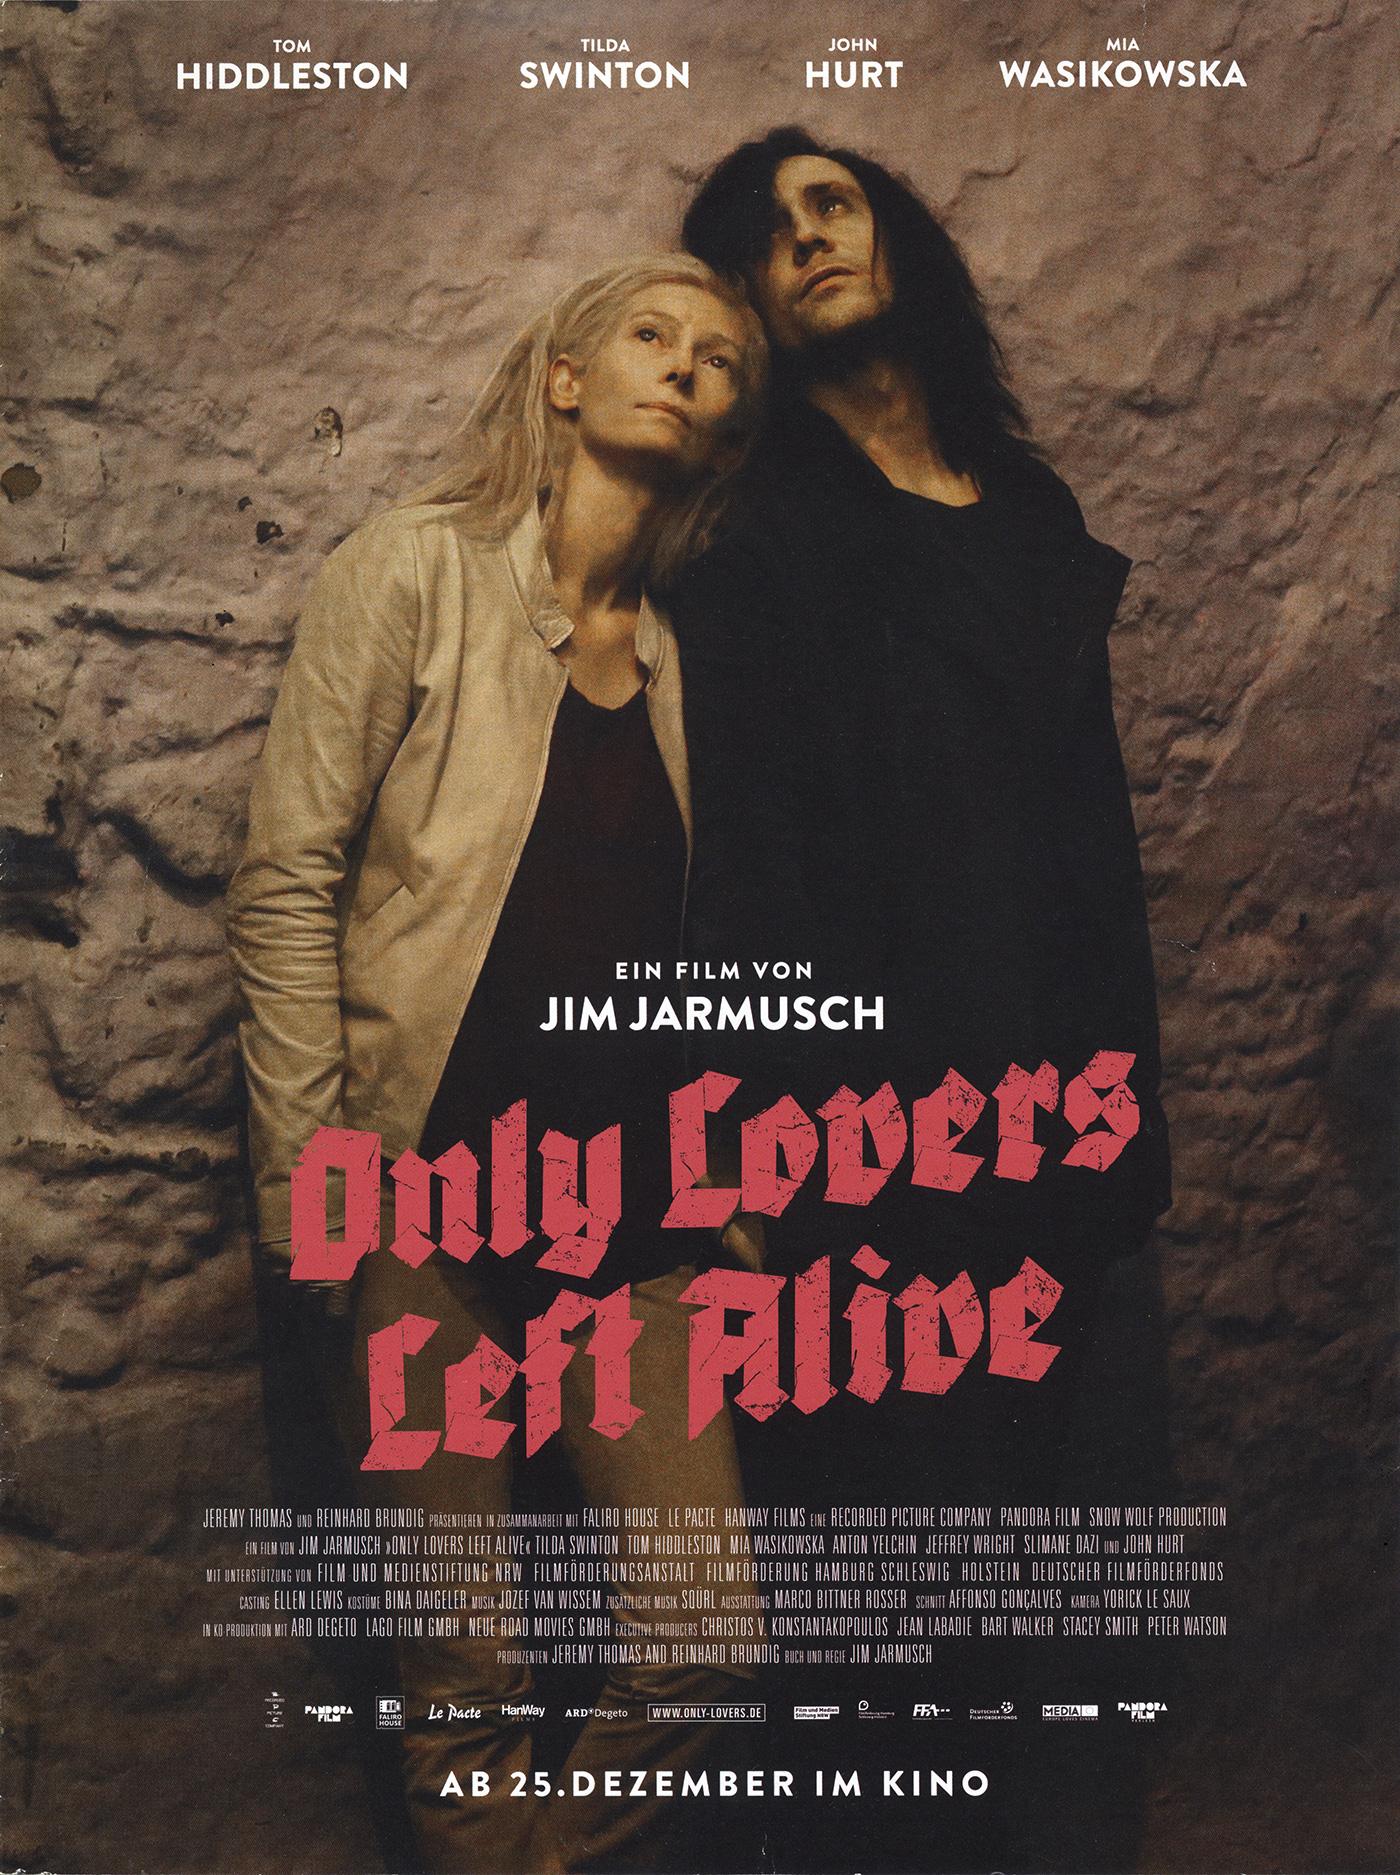 October 2nd: Only Lovers Left Alive (2013)